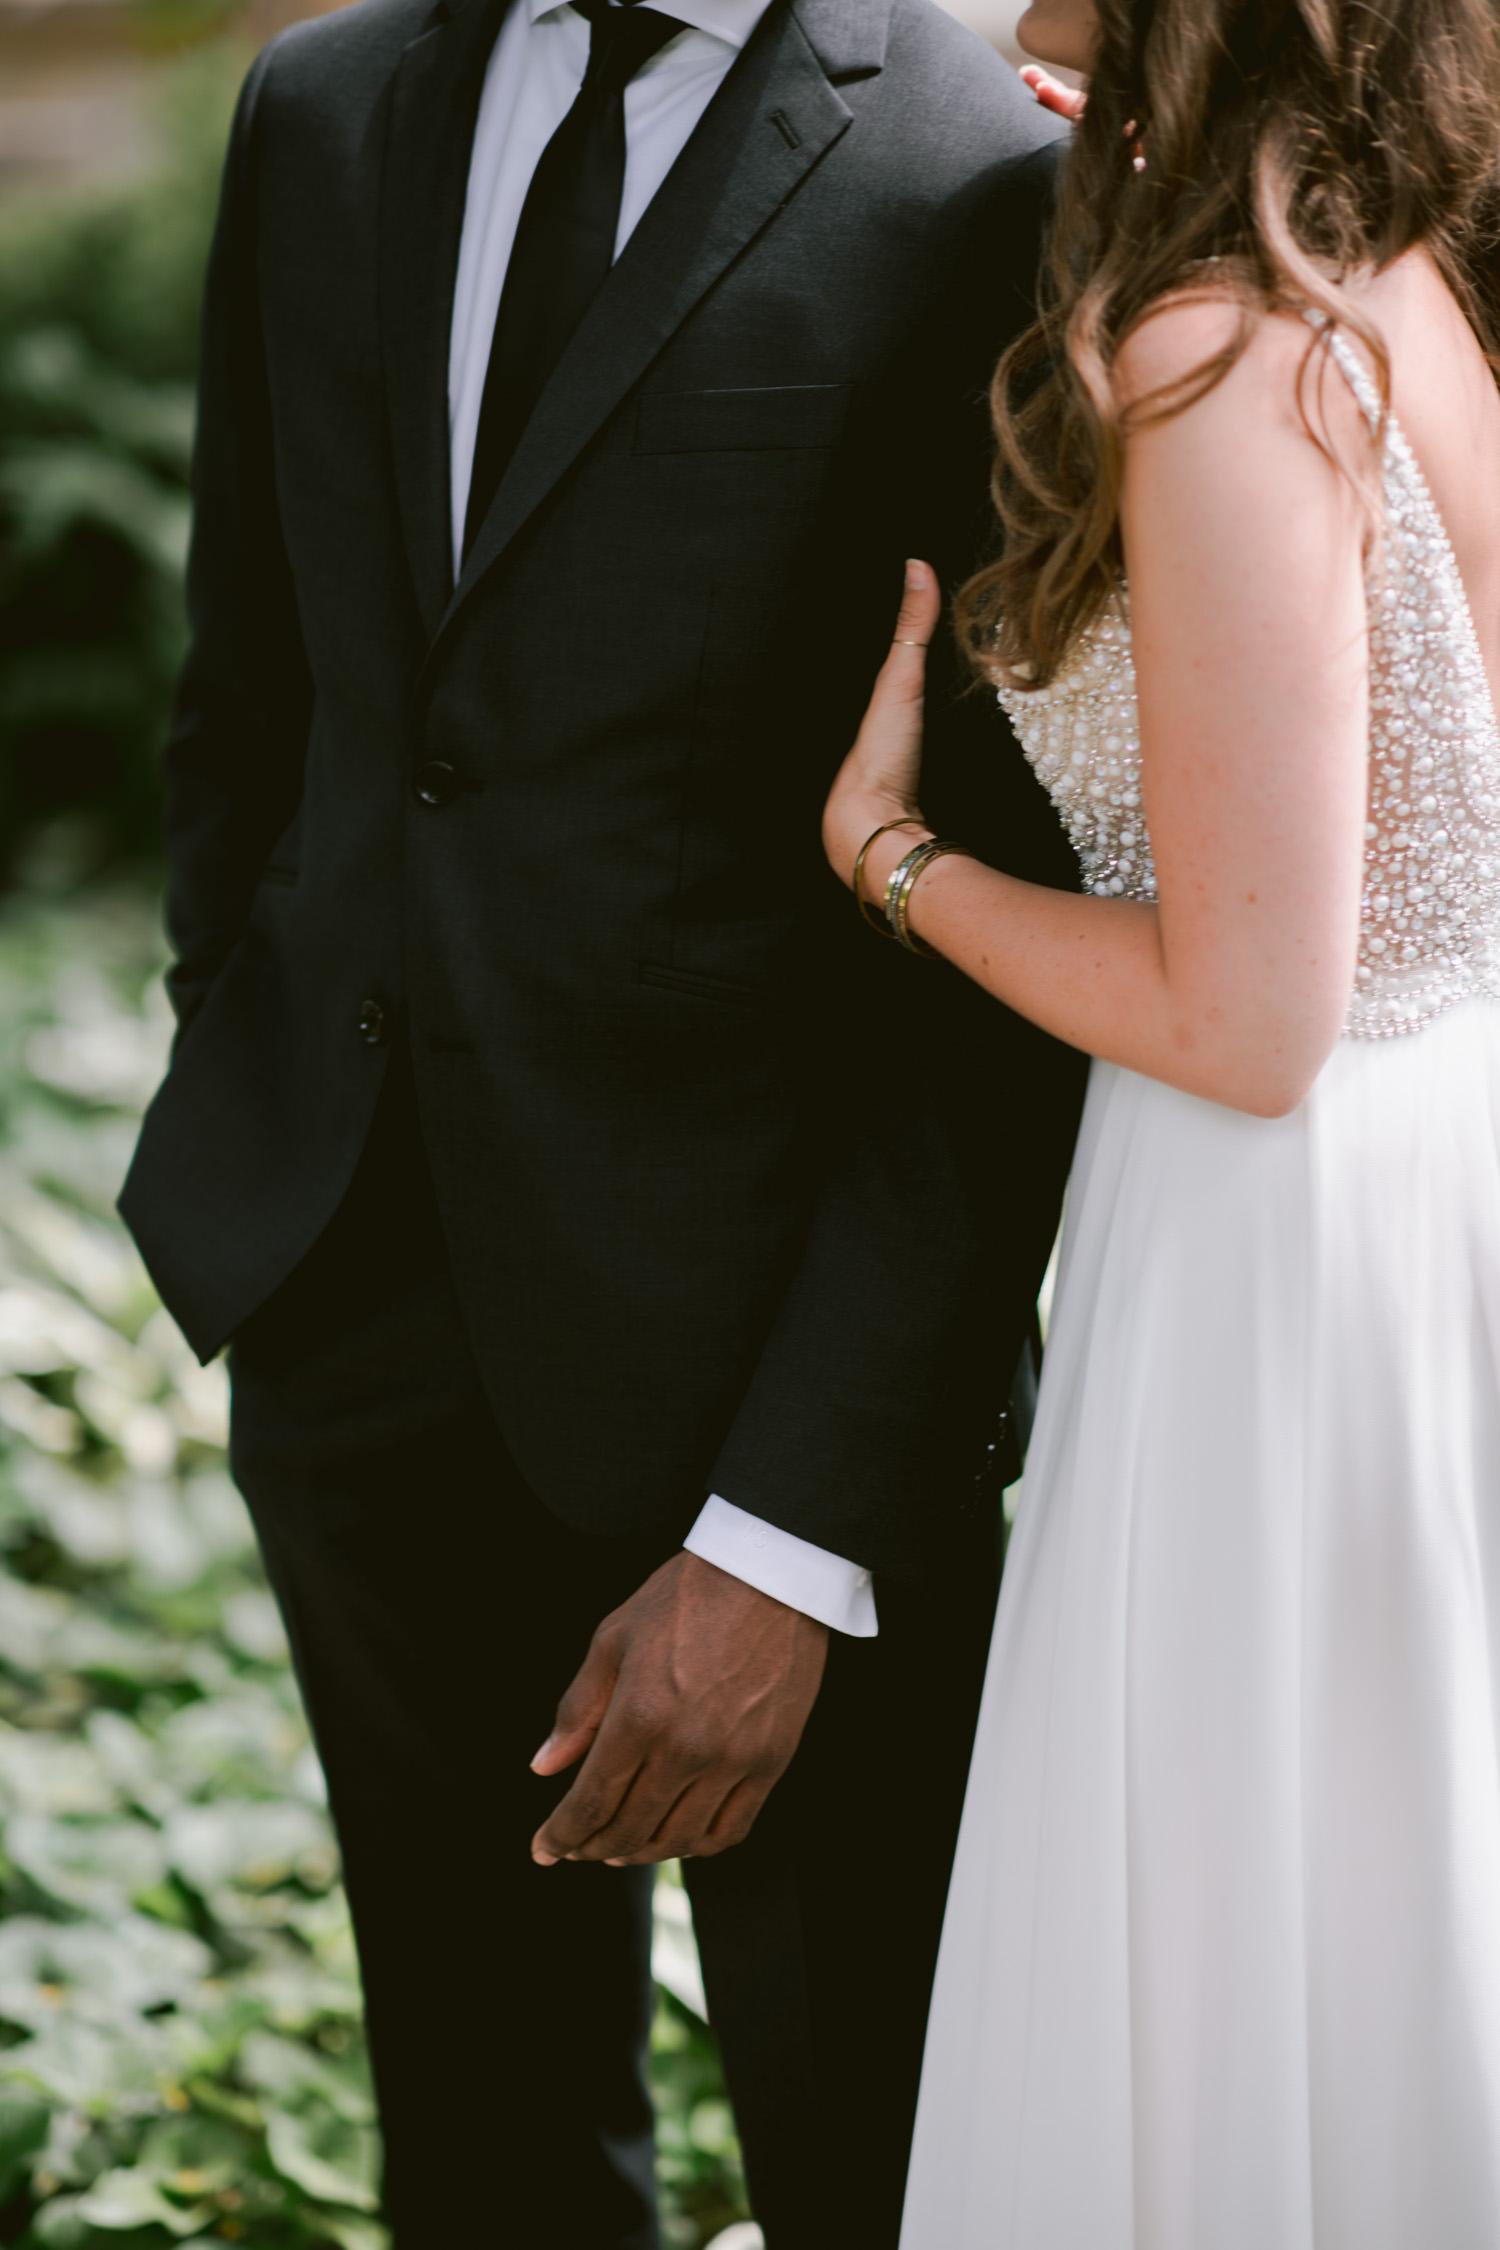 Intimate wedding elopement at Allen Gardens Toronto high end wedding photography